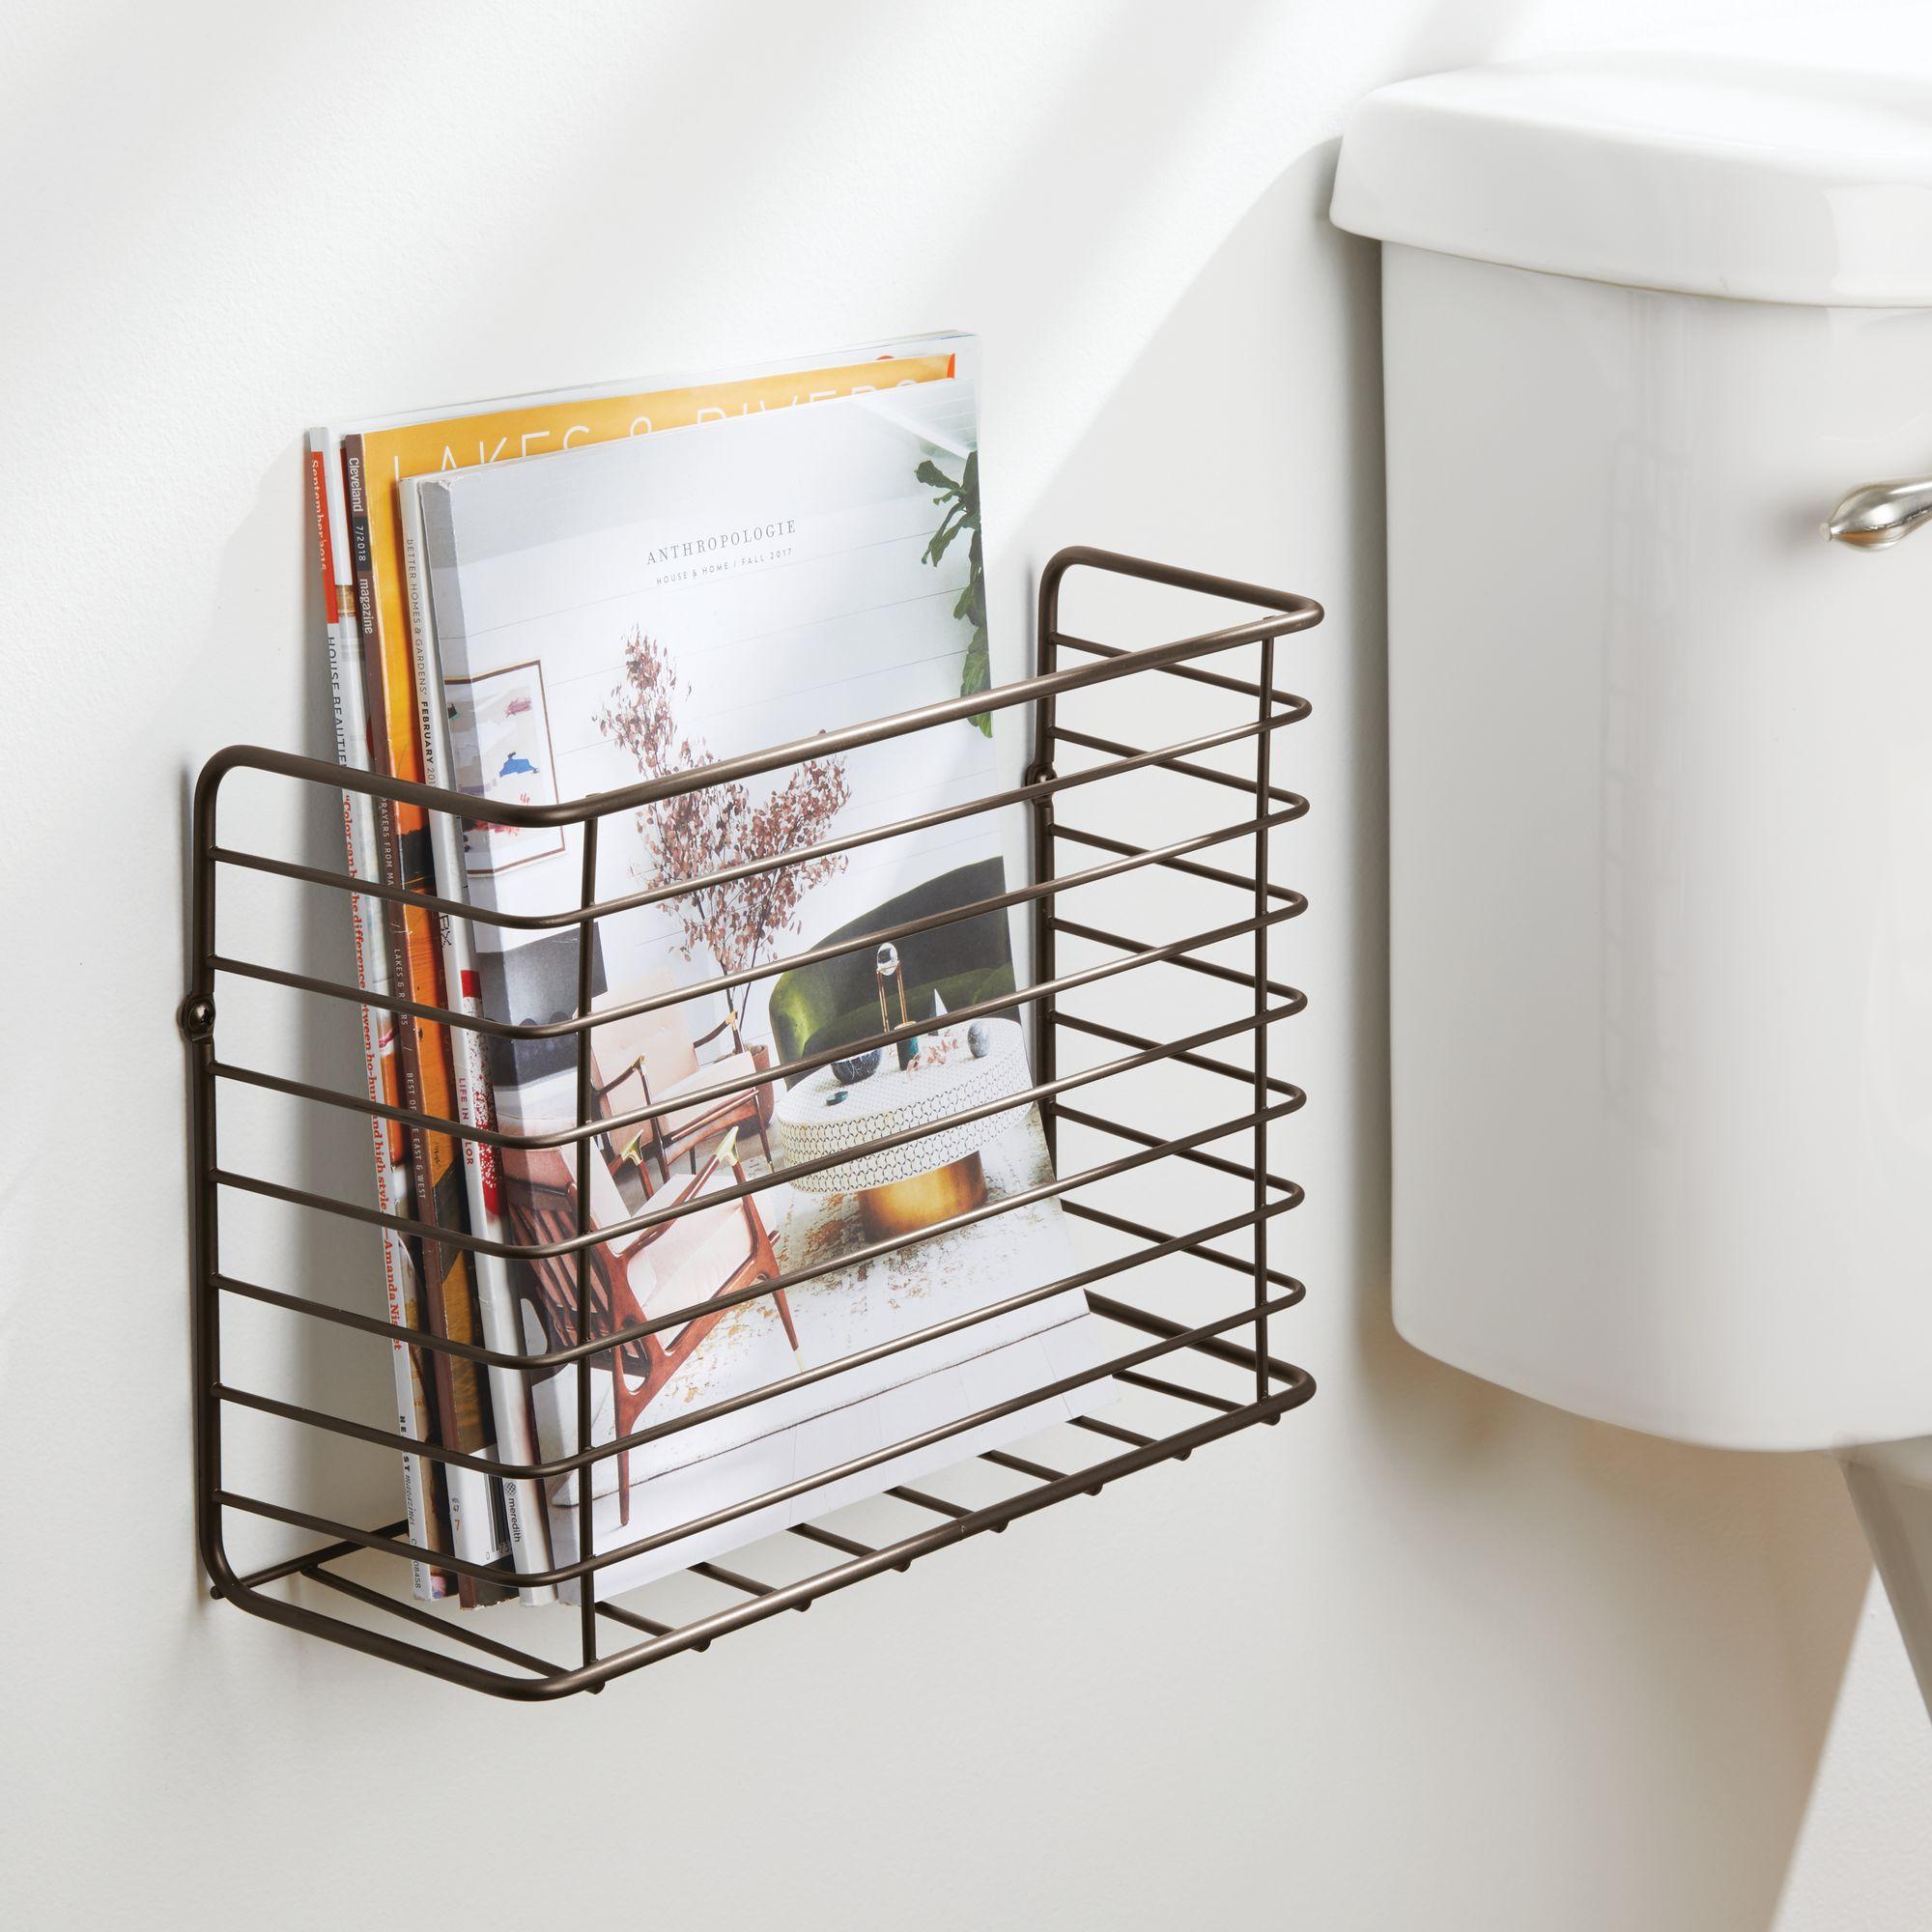 mDesign-Metal-Wall-Mount-Magazine-Holder-Storage-Organizer-Rack thumbnail 16